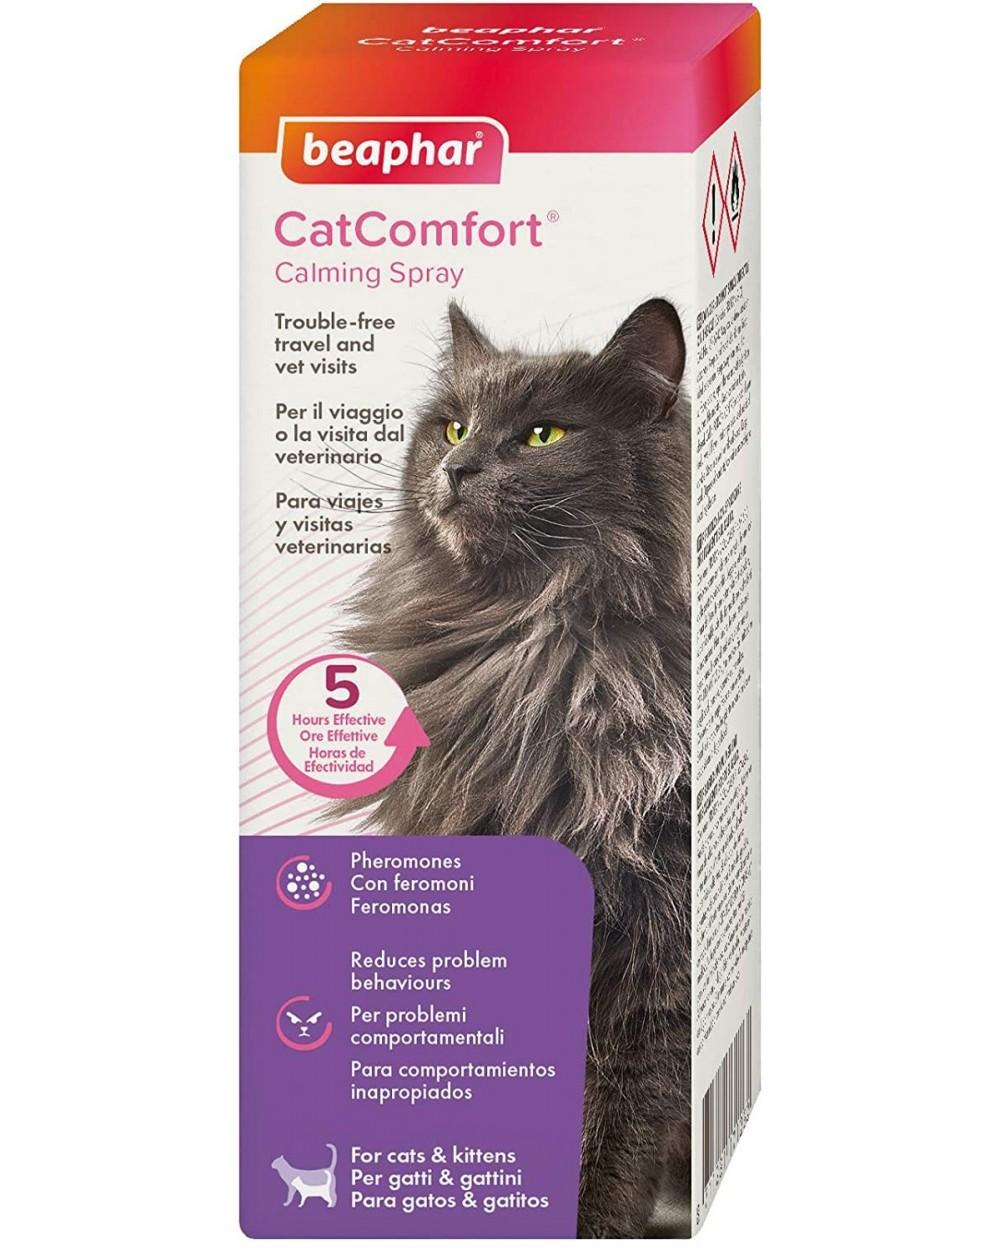 Beaphar Cat Comfort Calming Spray 60 ml